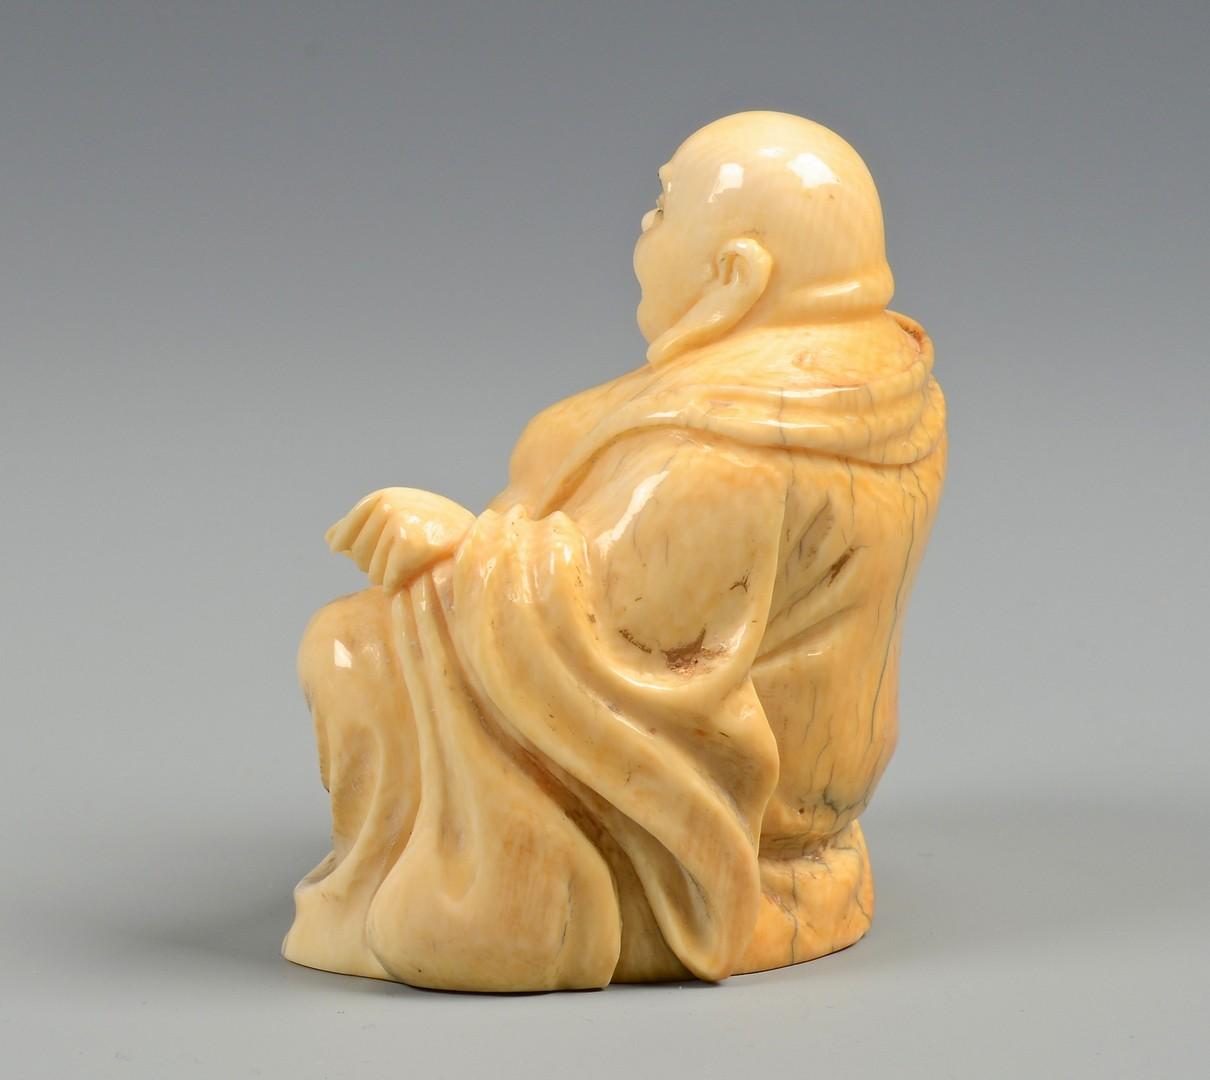 Lot 375: 2 Carved Ivory Figures